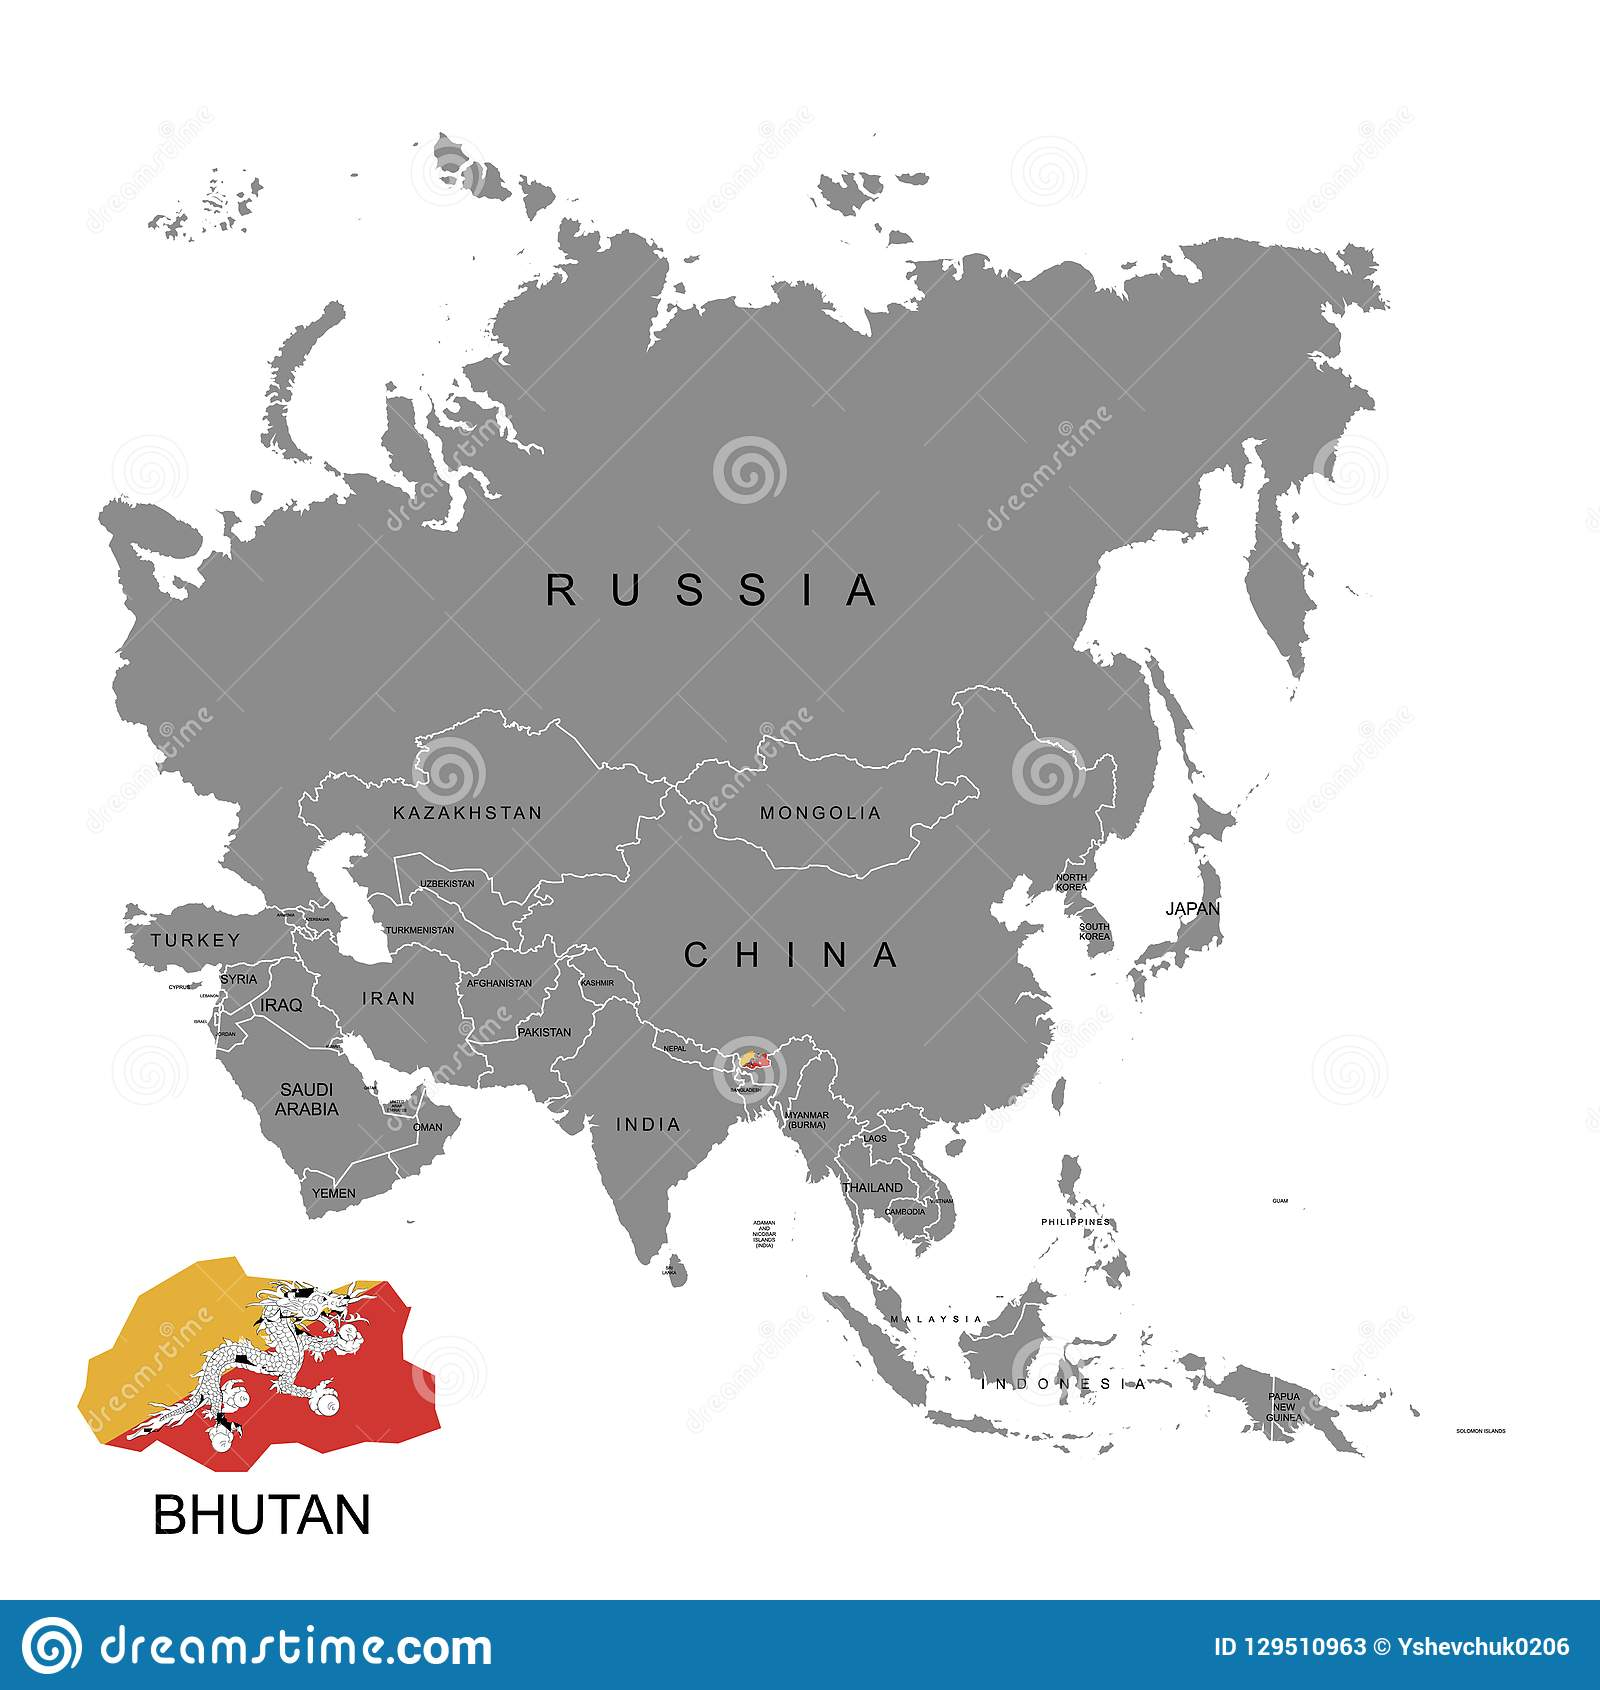 Territory Of Bhutan On Asia Continent  Flag Of Bhutan